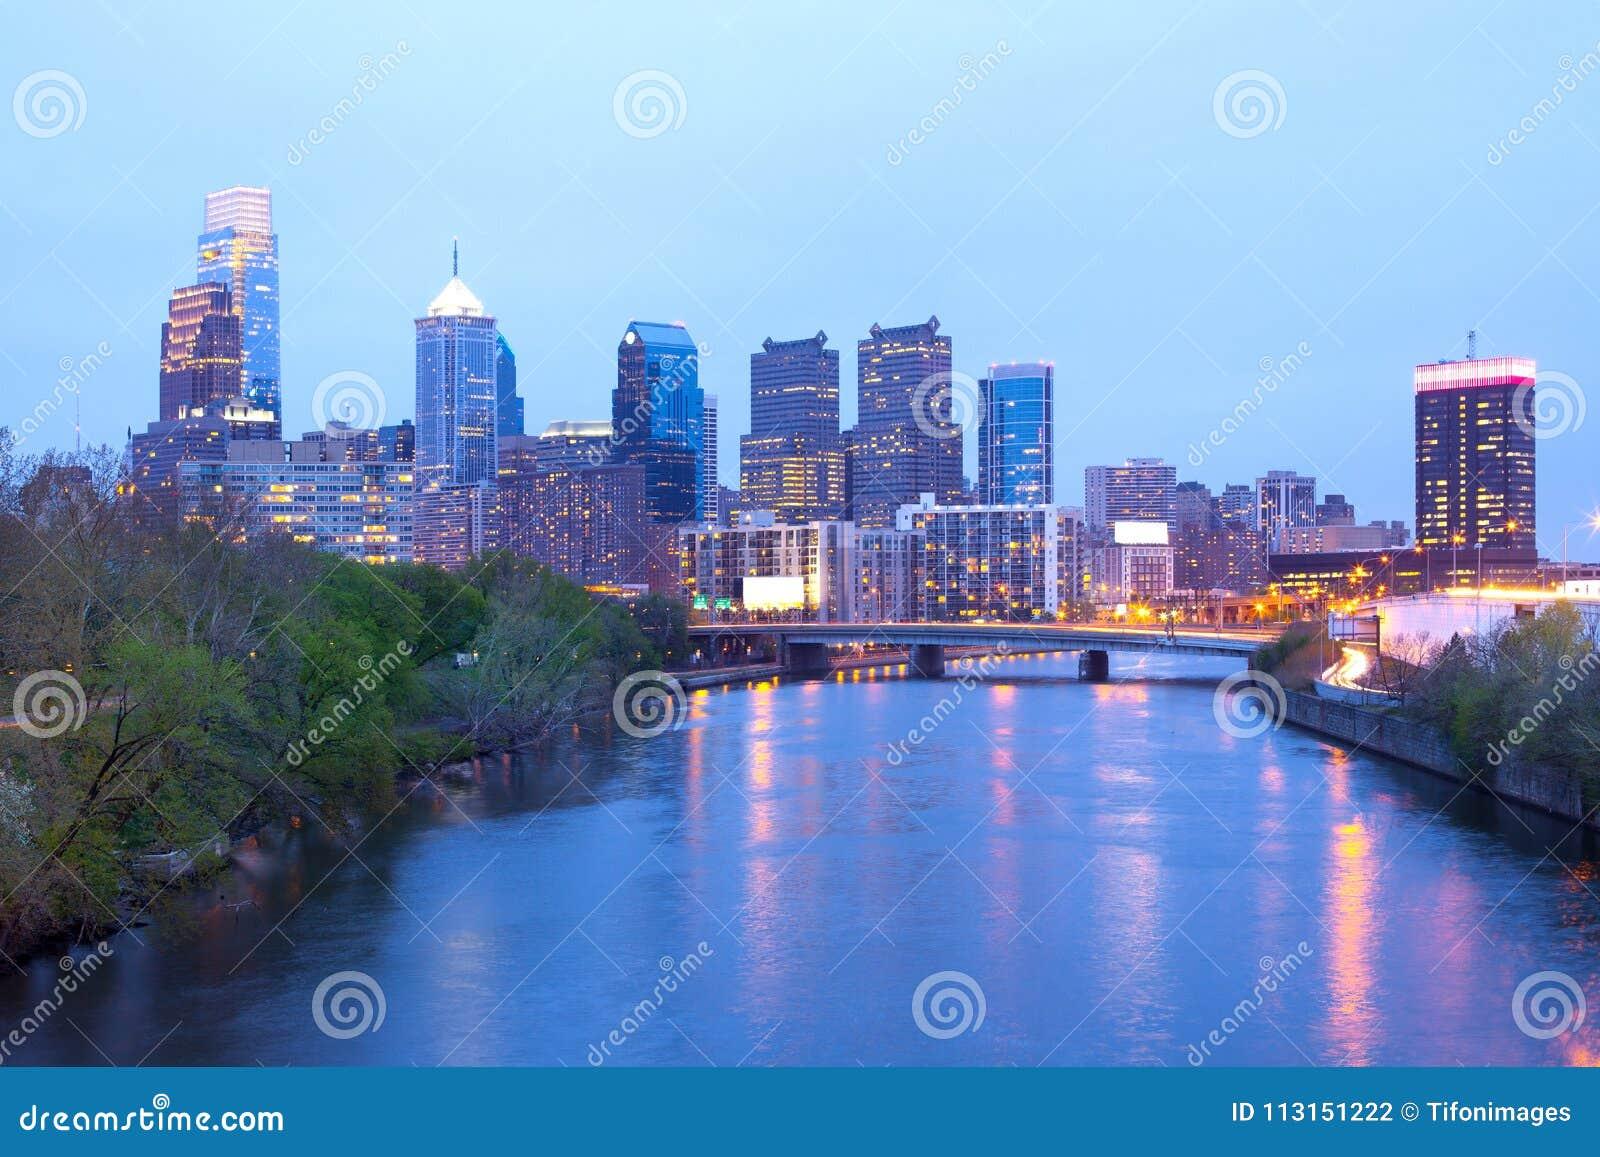 Schuylkill River and city skyline of Philadelphia